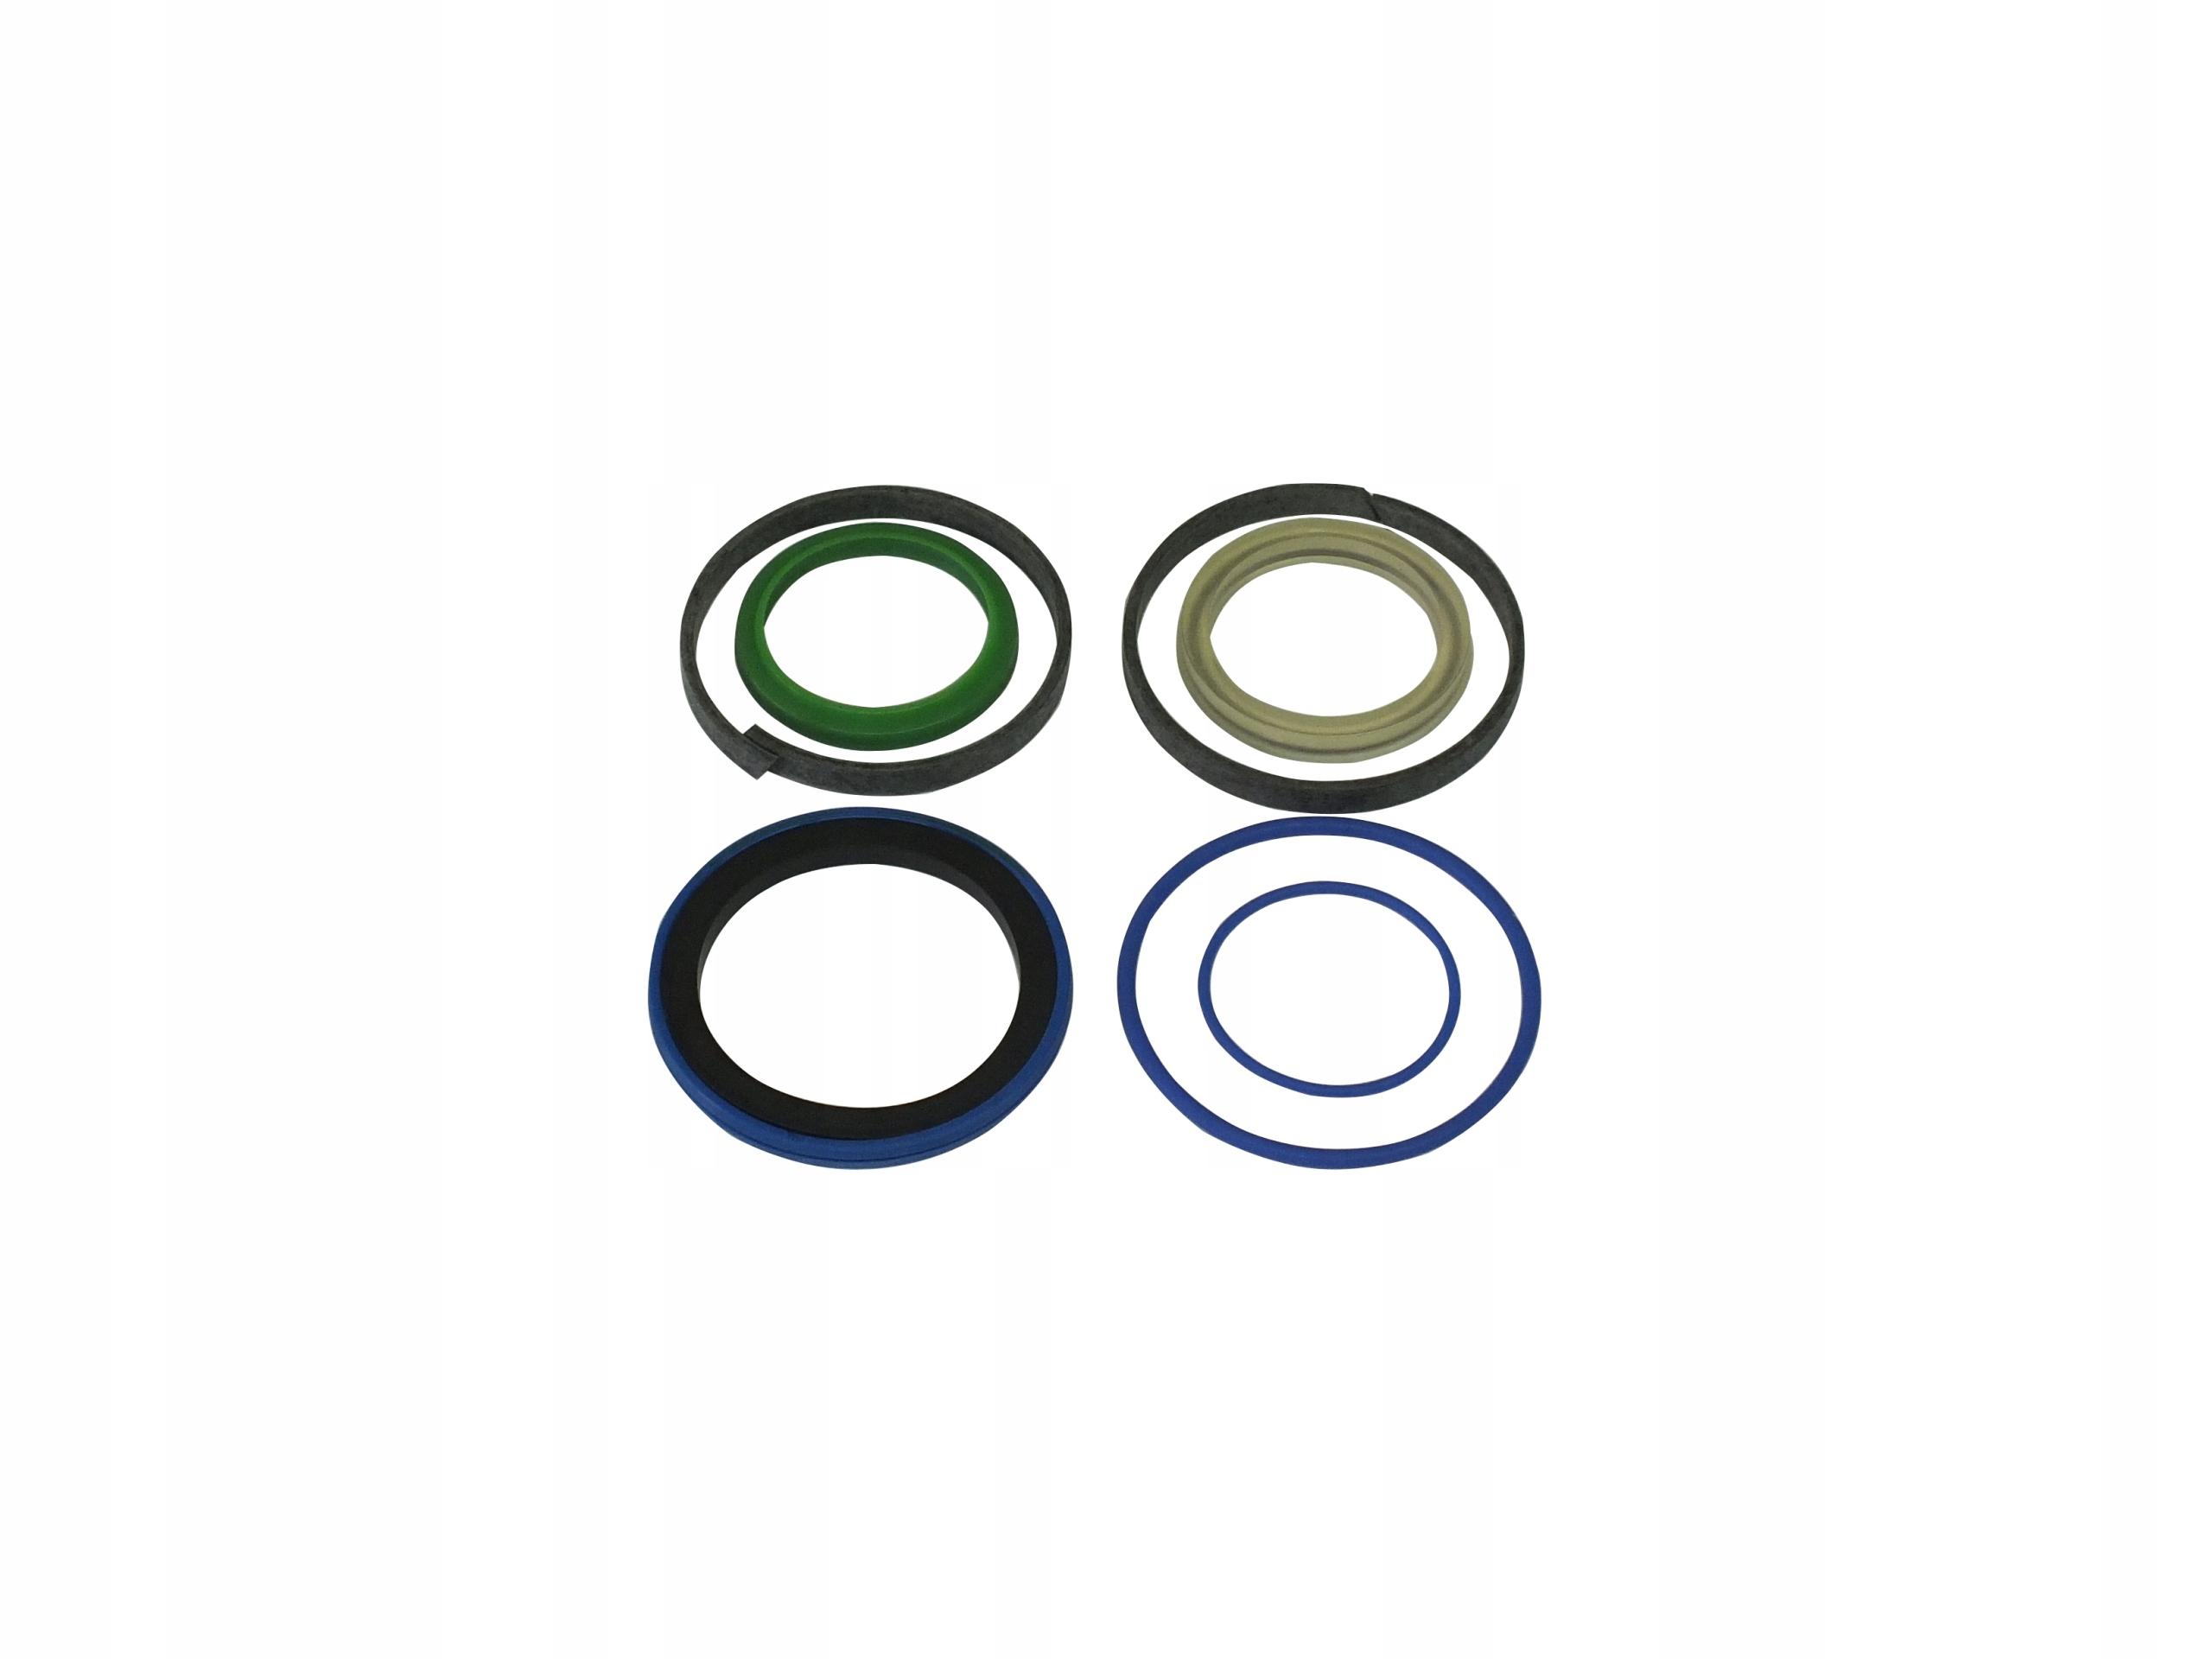 Комплект уплотнений гидроцилиндра JCB 3CX,4CX, 60x110 изображение 1